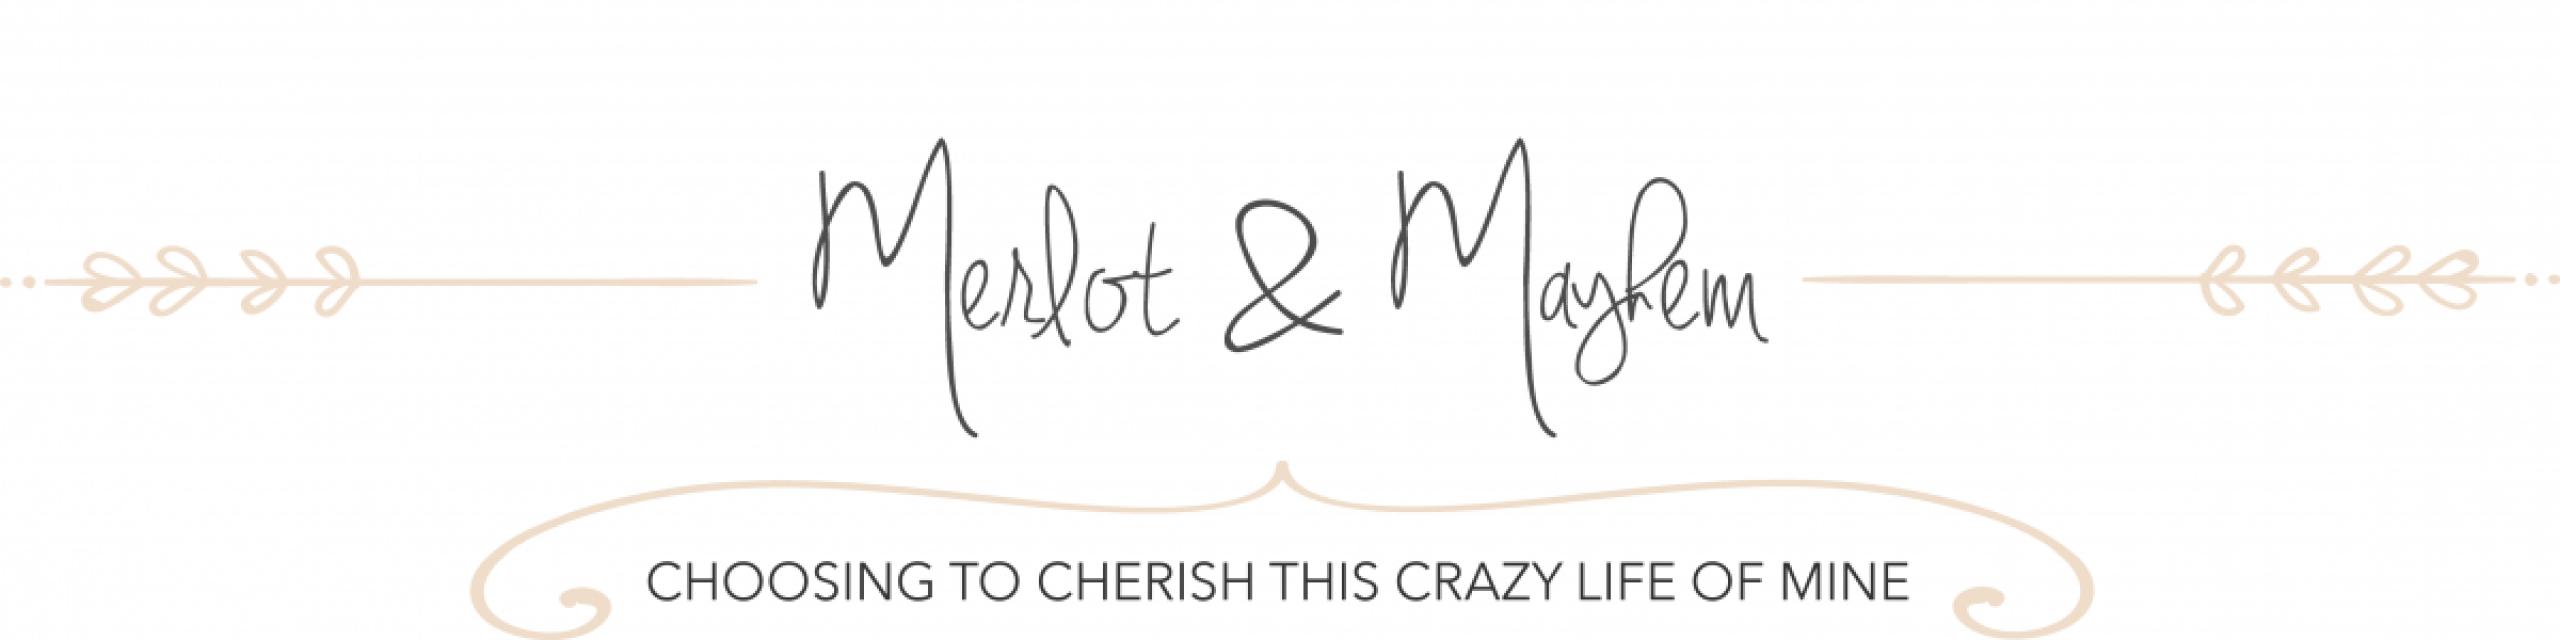 MERLOT & MAYHEM